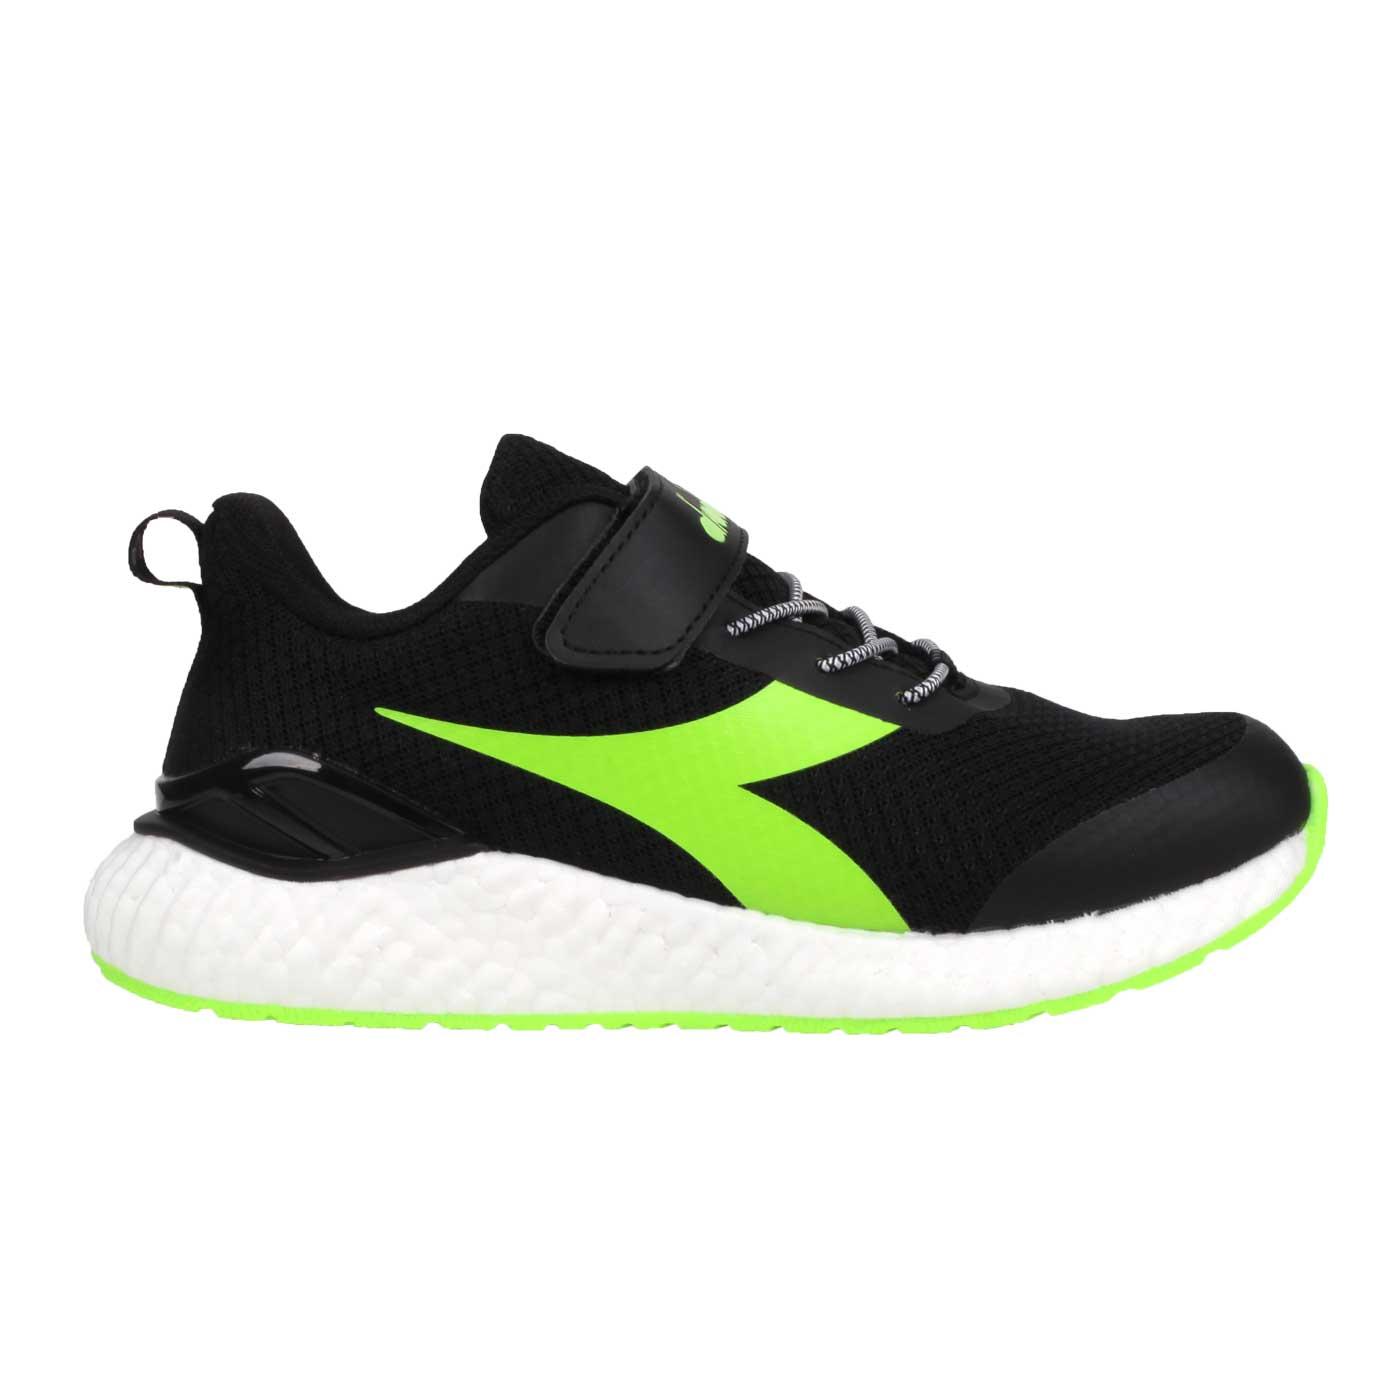 DIADORA 大童運動慢跑鞋 DA13019 - 黑綠